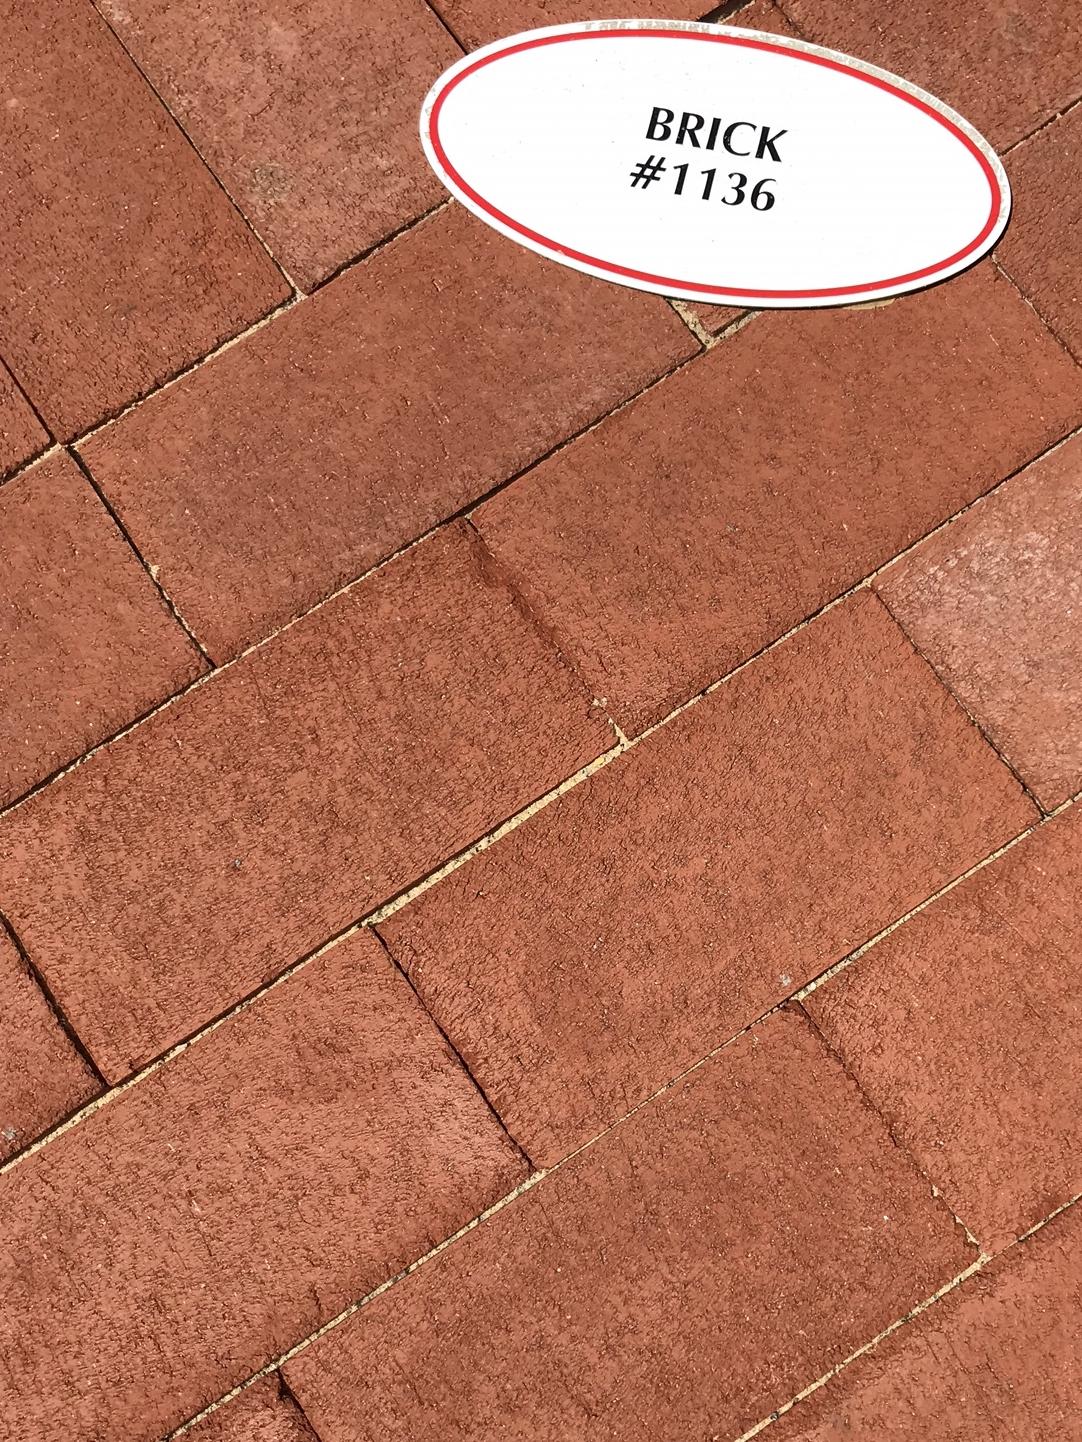 Brick #1136